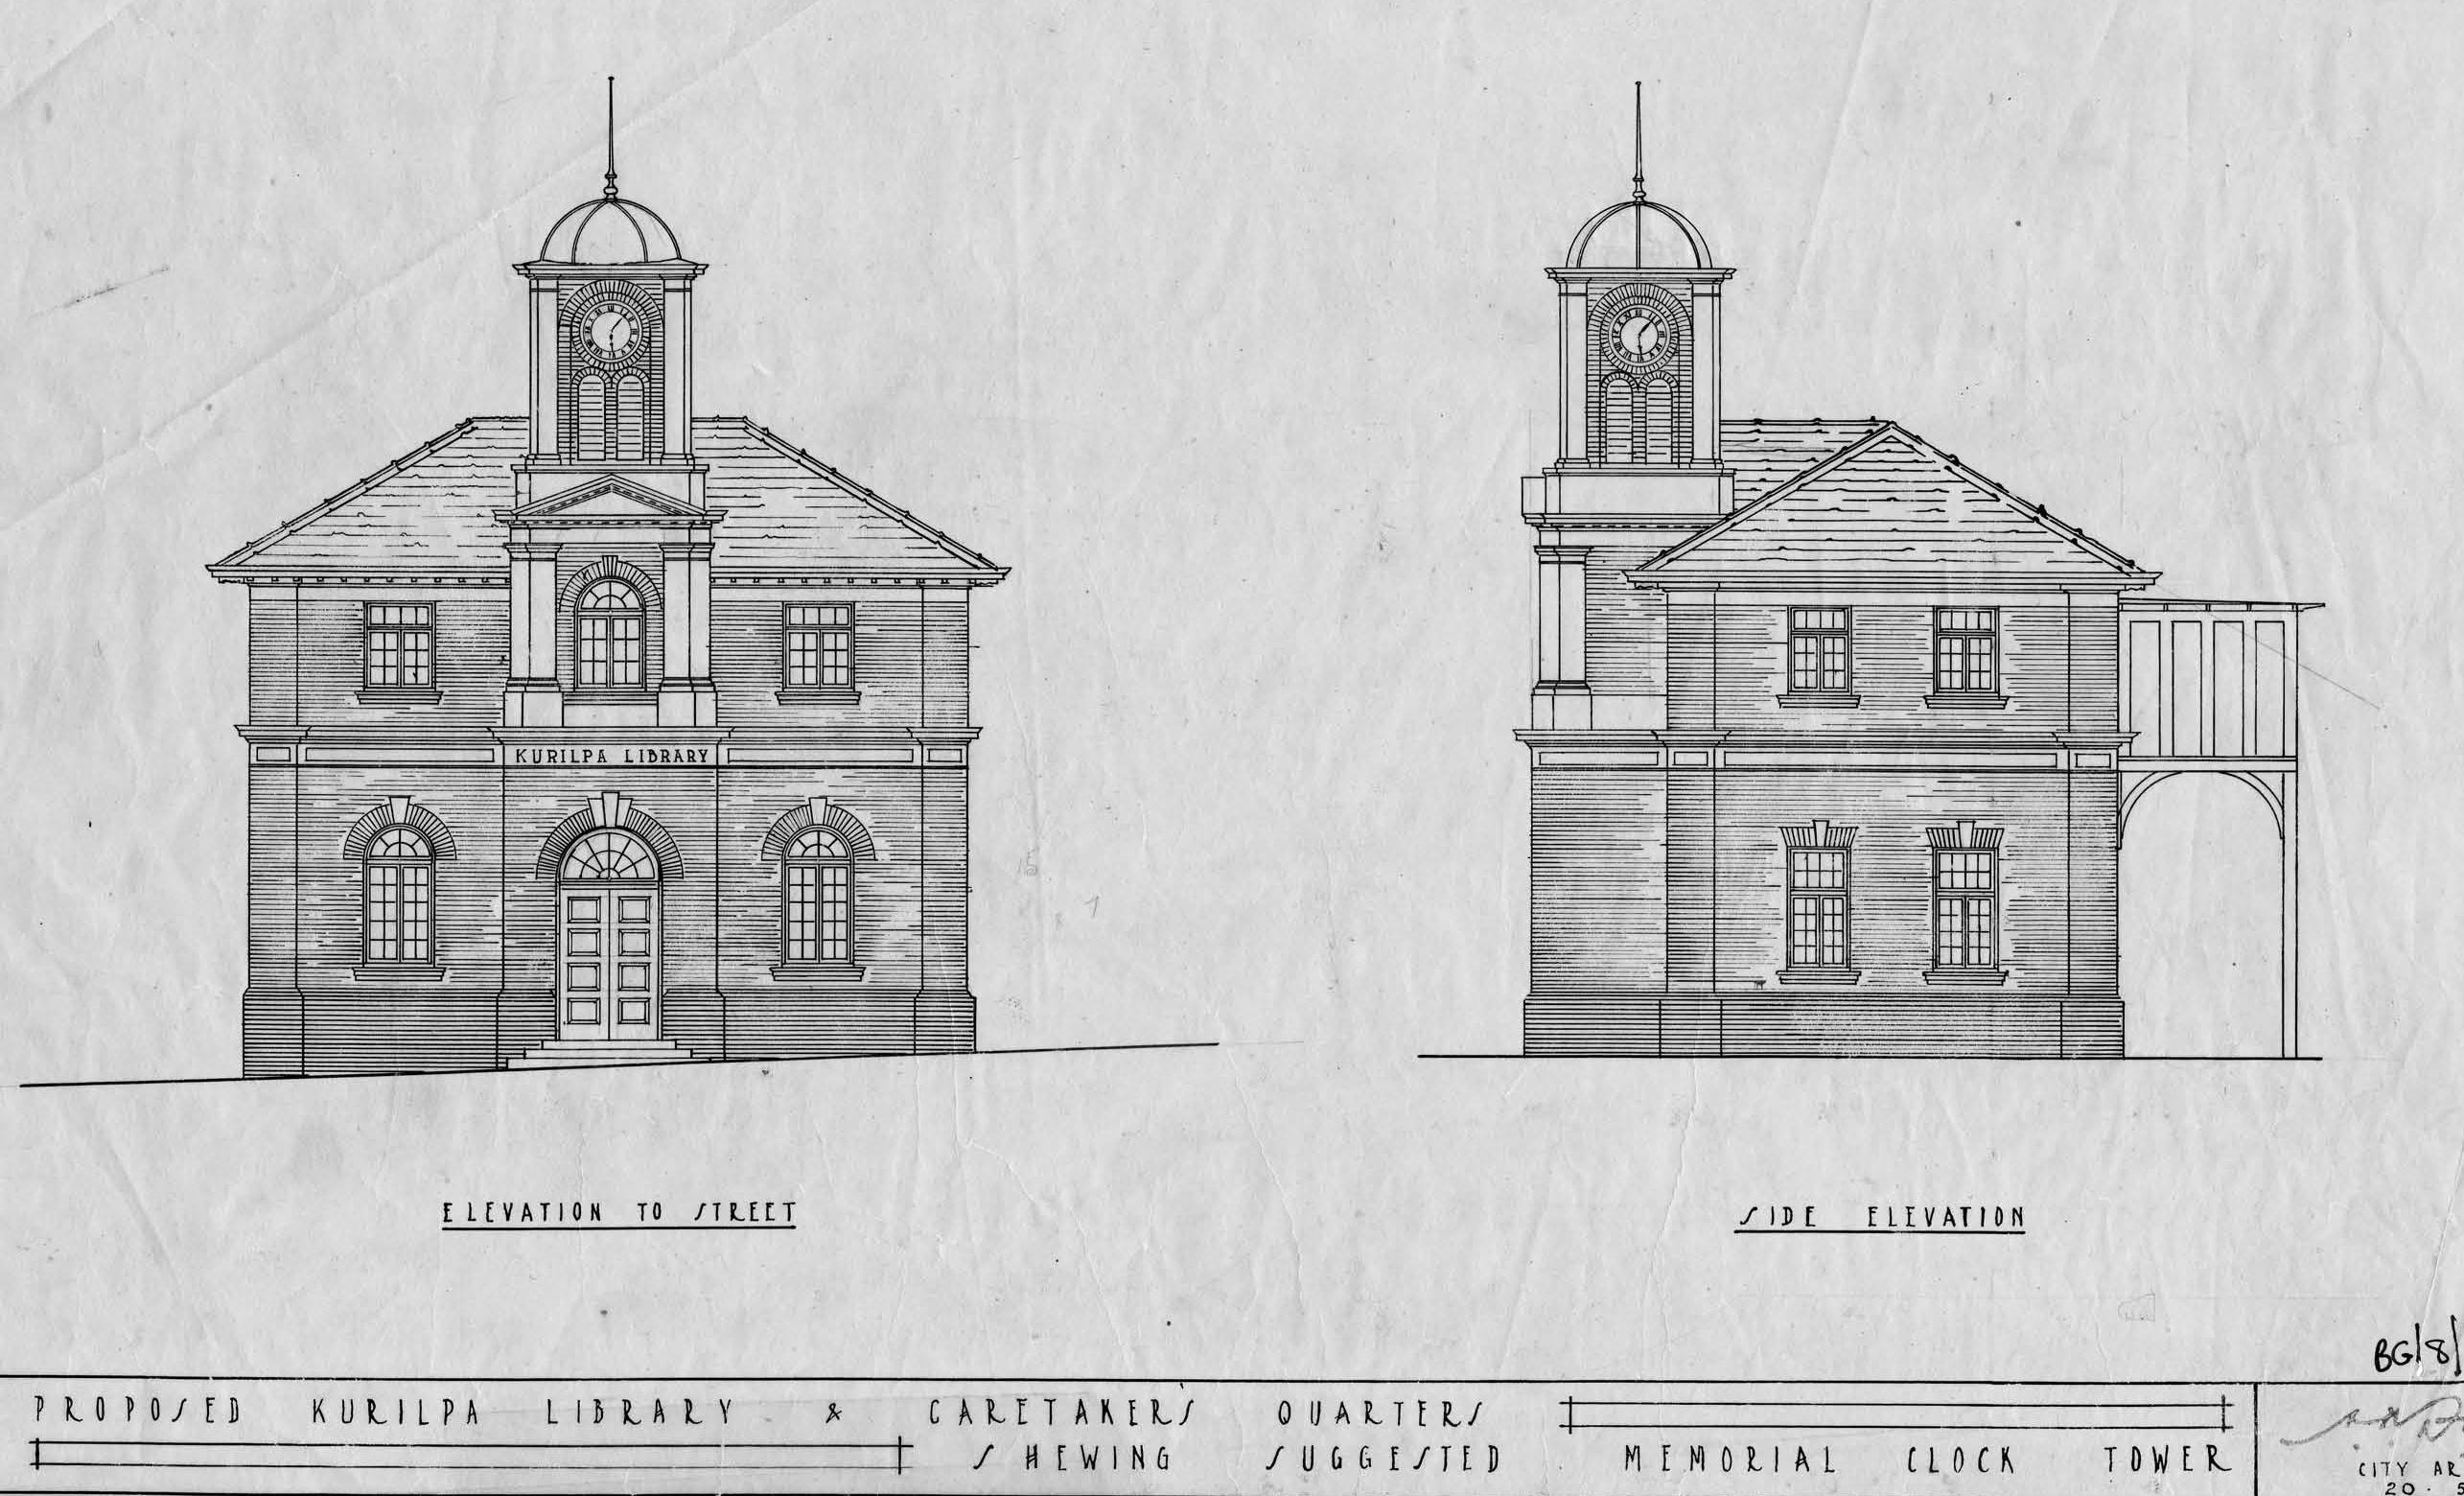 kurilpa library plan 1927 BCC